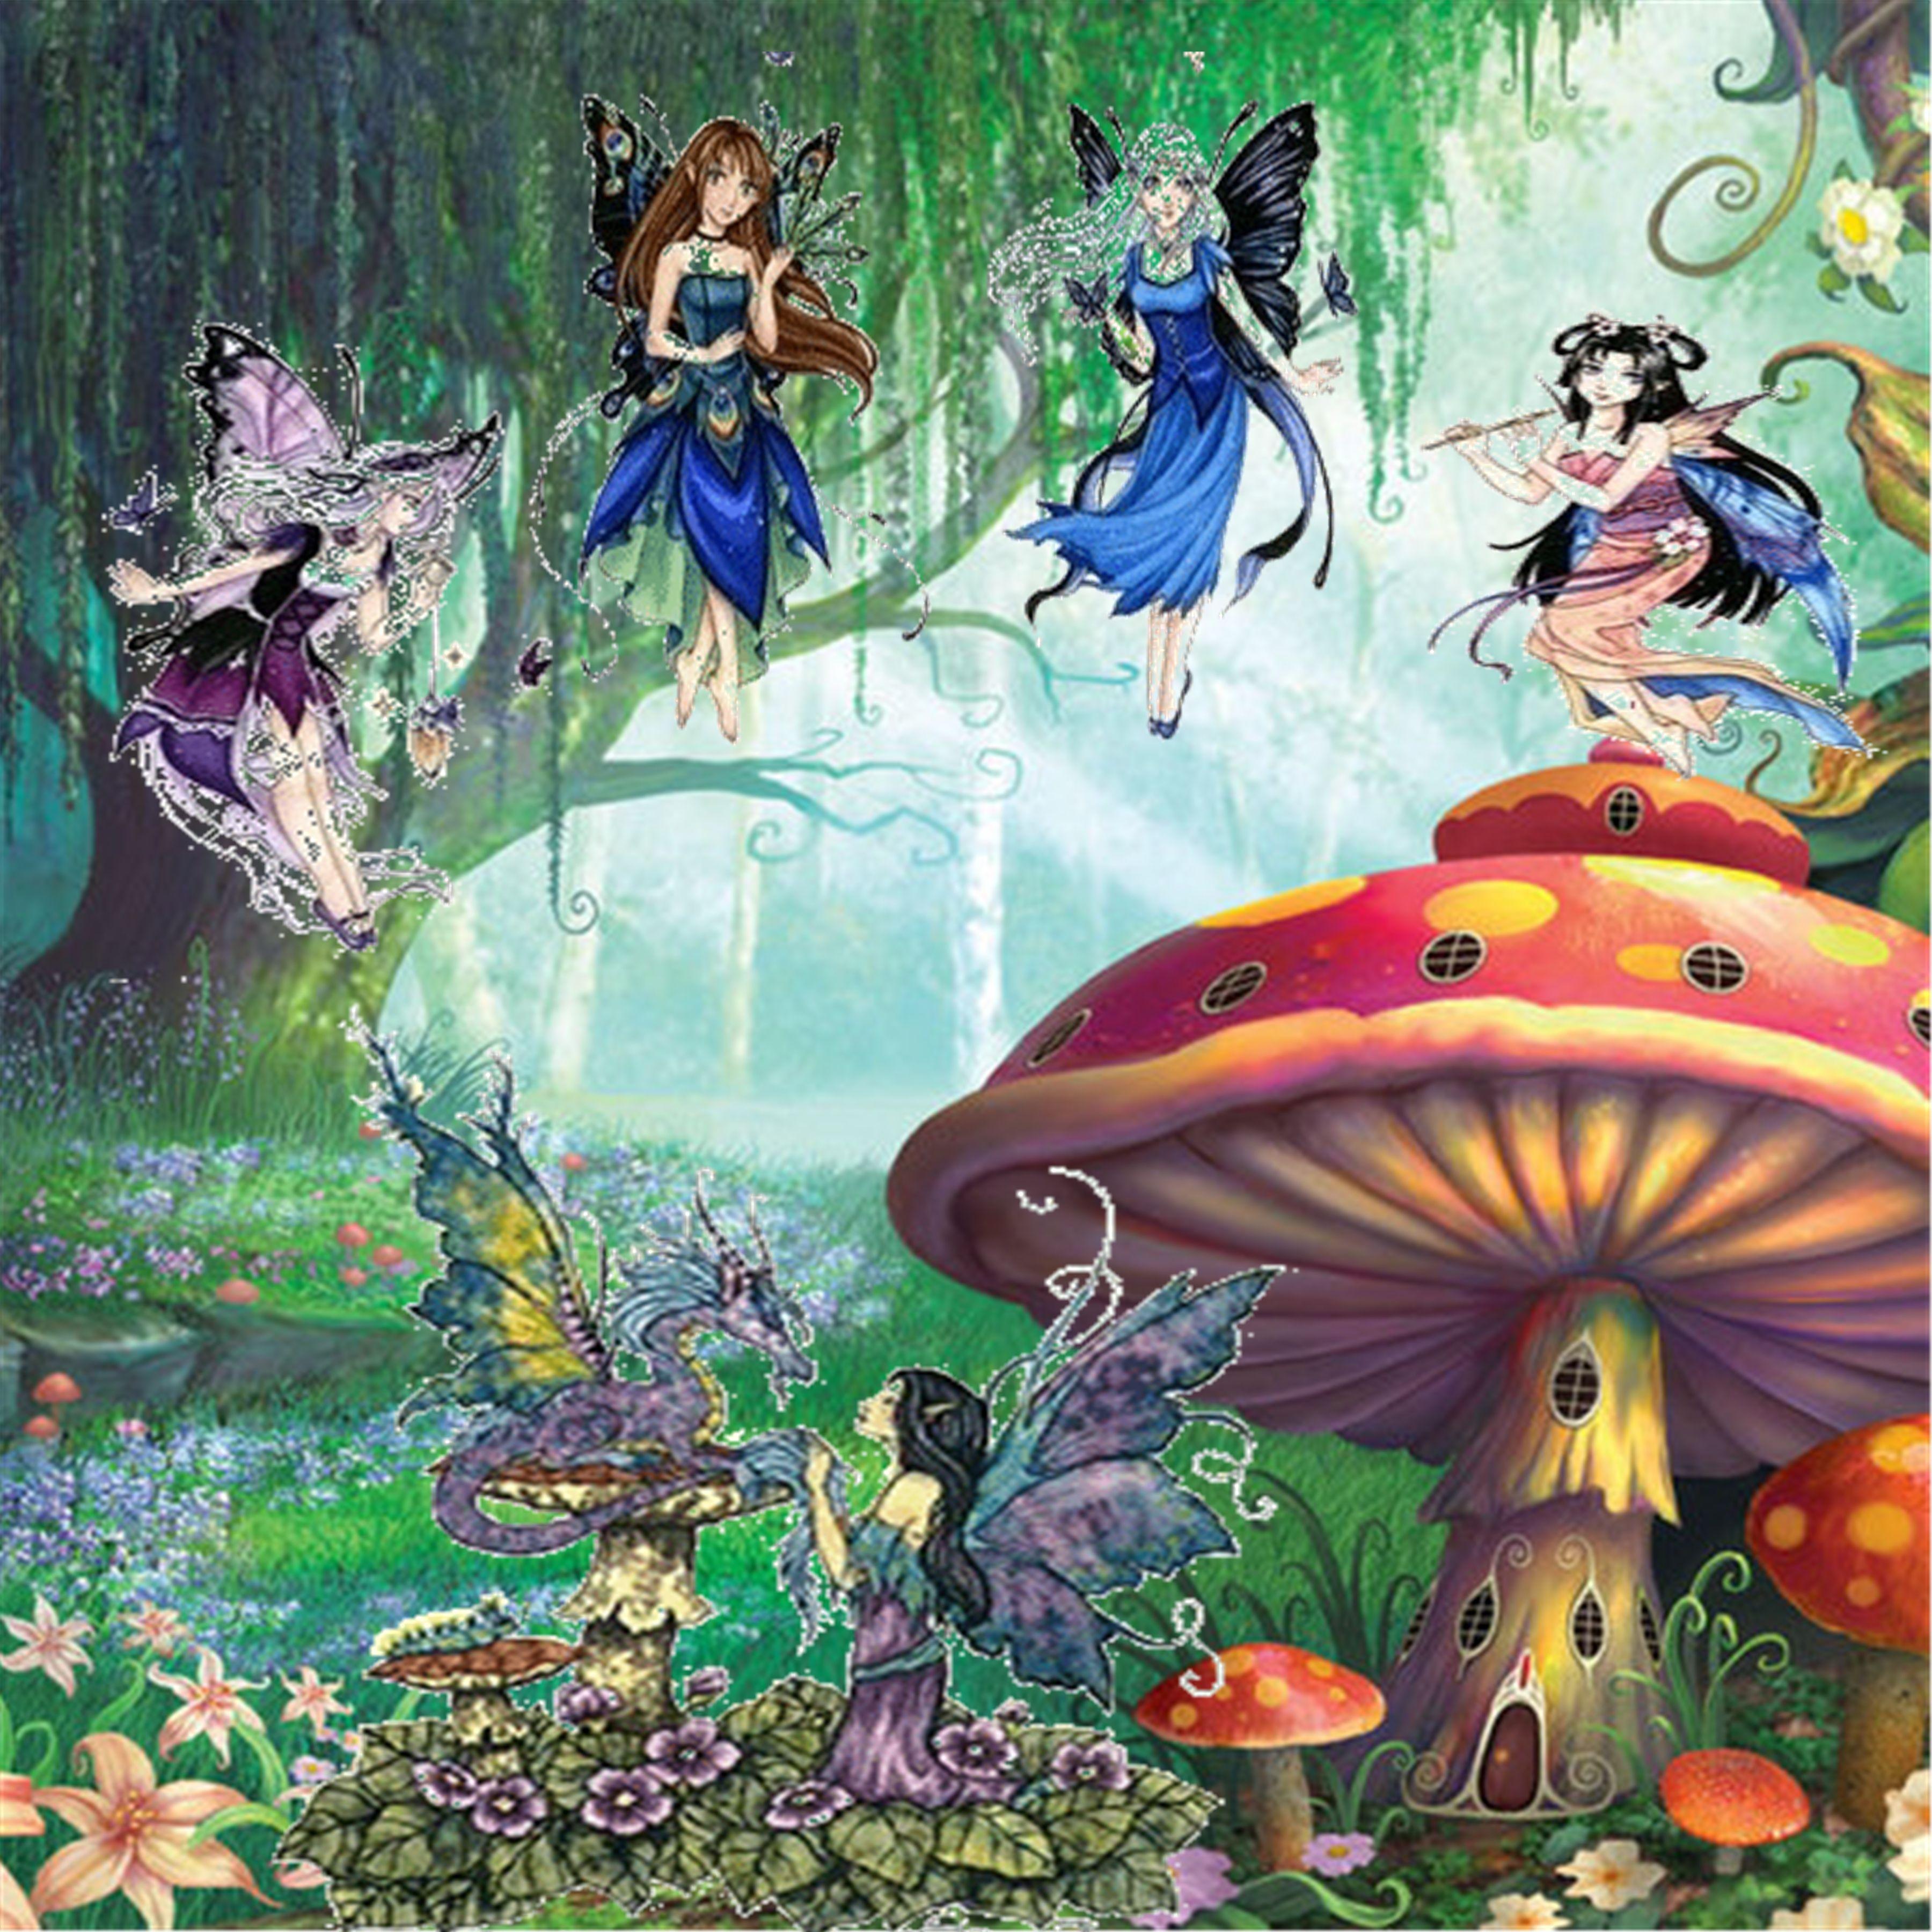 mushrooms and fairies   Mushrooms   Pinterest   Fairies ...  mushrooms and f...